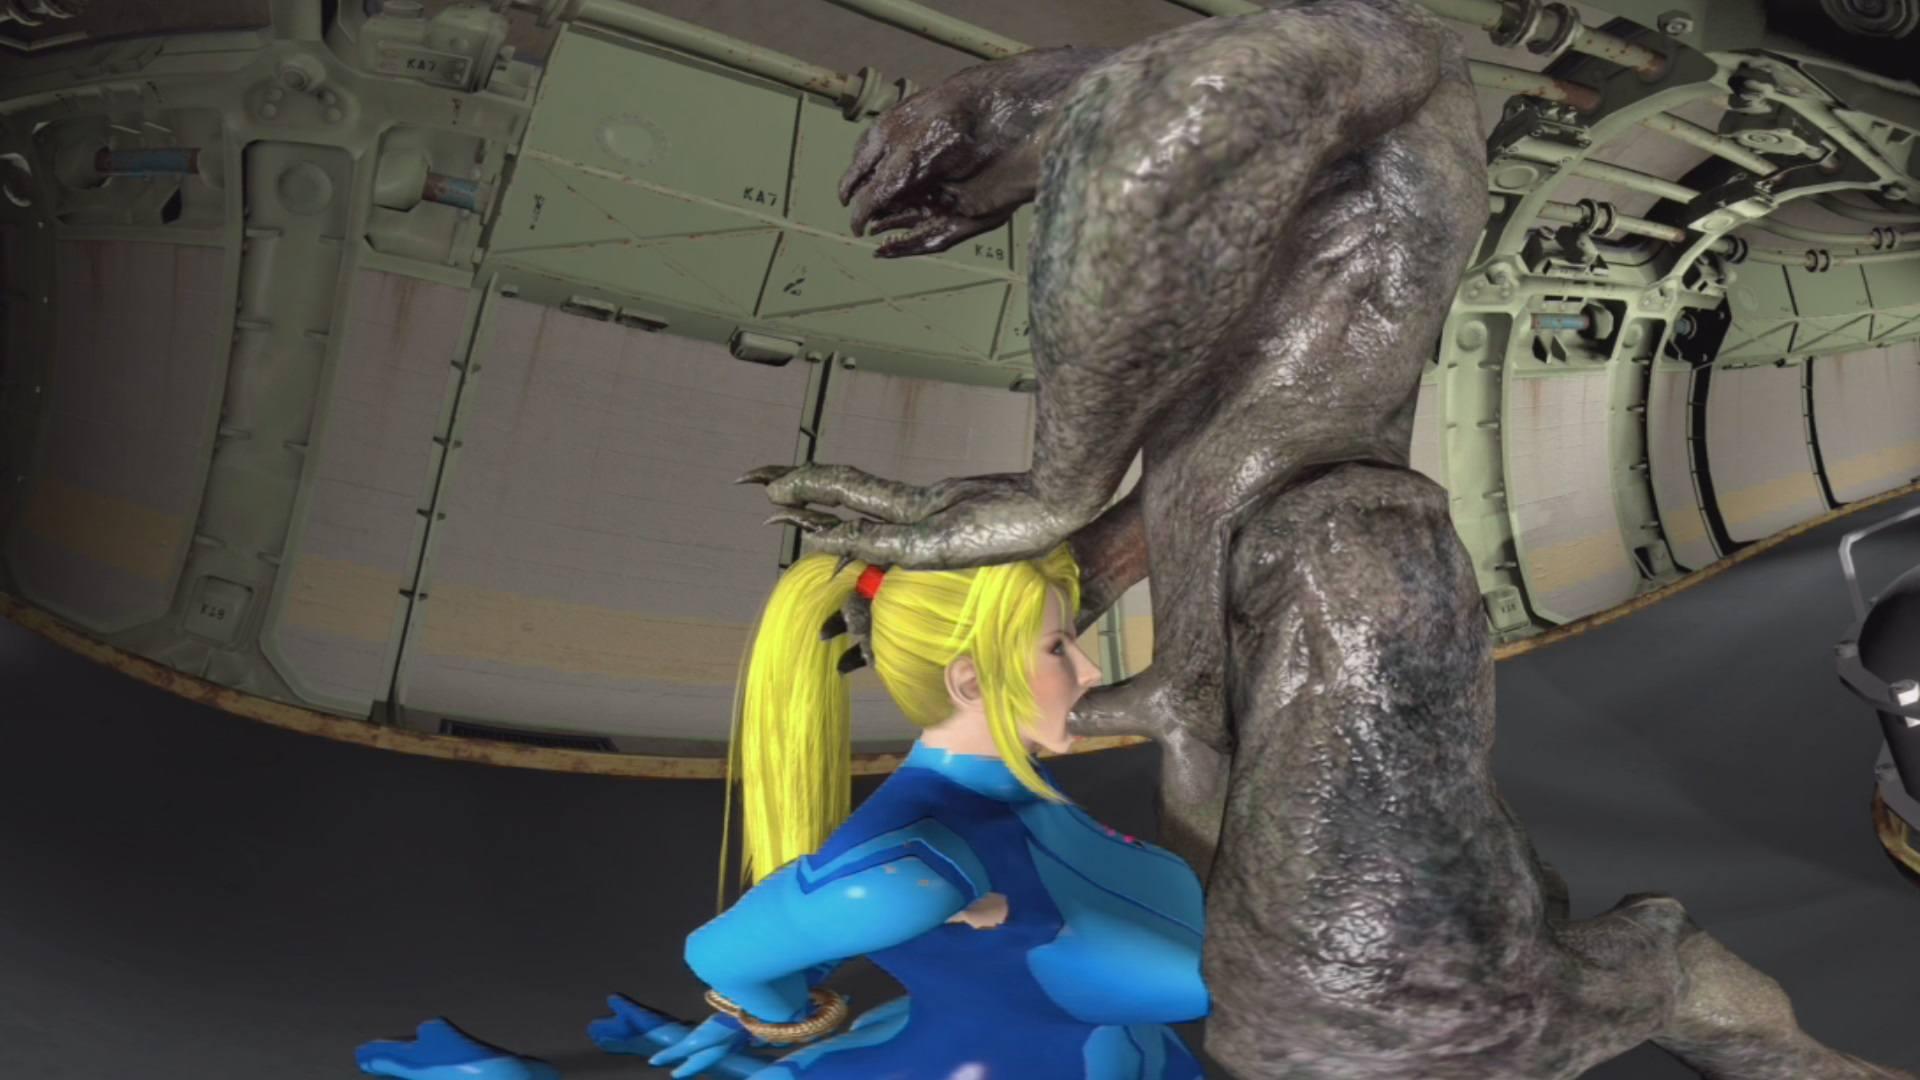 alien cartoon porn videos - Samus throat fucked by an alien CGI Girl ViceSFM vr porn video vrporn.com  virtual ...